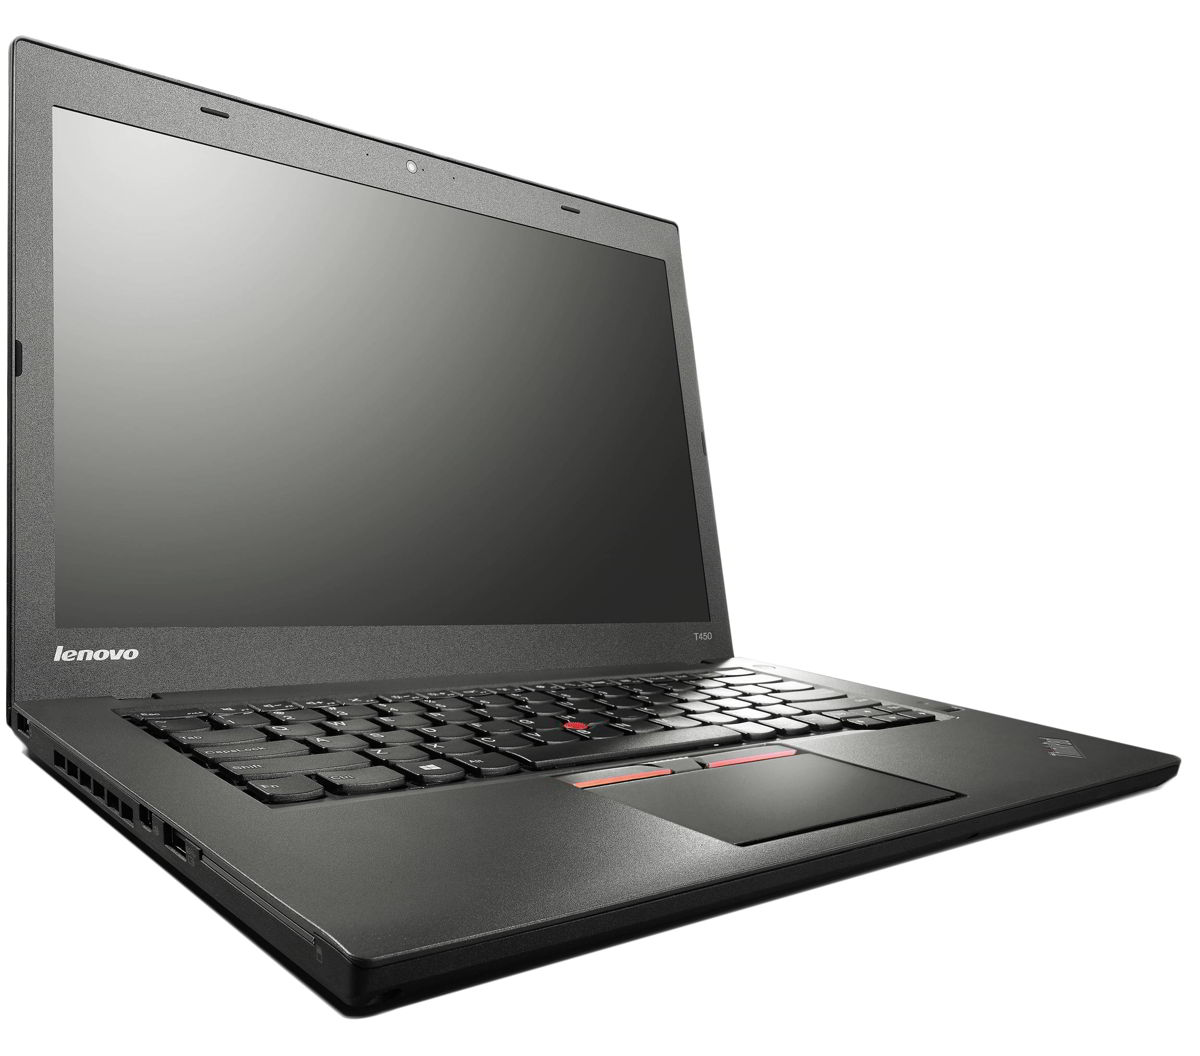 Como eliminar McAfee de una computadora Lenovo con Windows 10